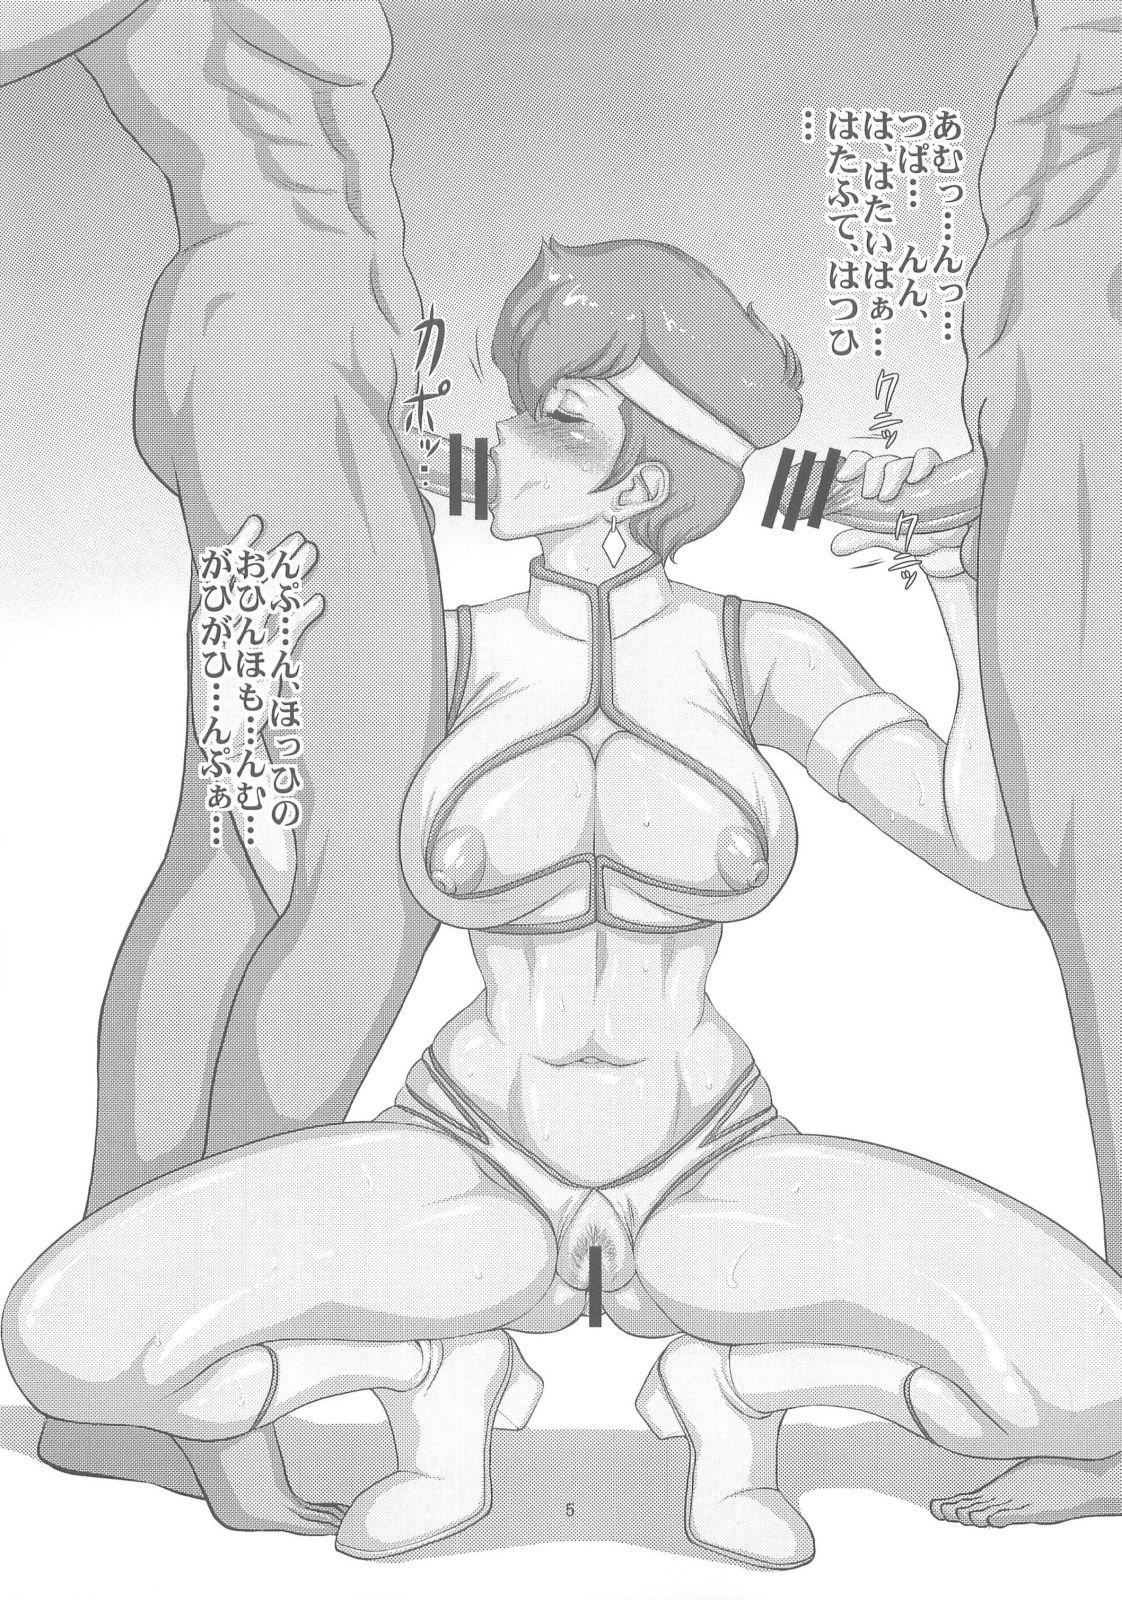 (C83) [Kikumizuan (Kikumizu Shouichi)] Lovely Erotics ~ K*i no Baai ~   Lovely Erotics -The Case of K*i- (Dirty Pair) 6